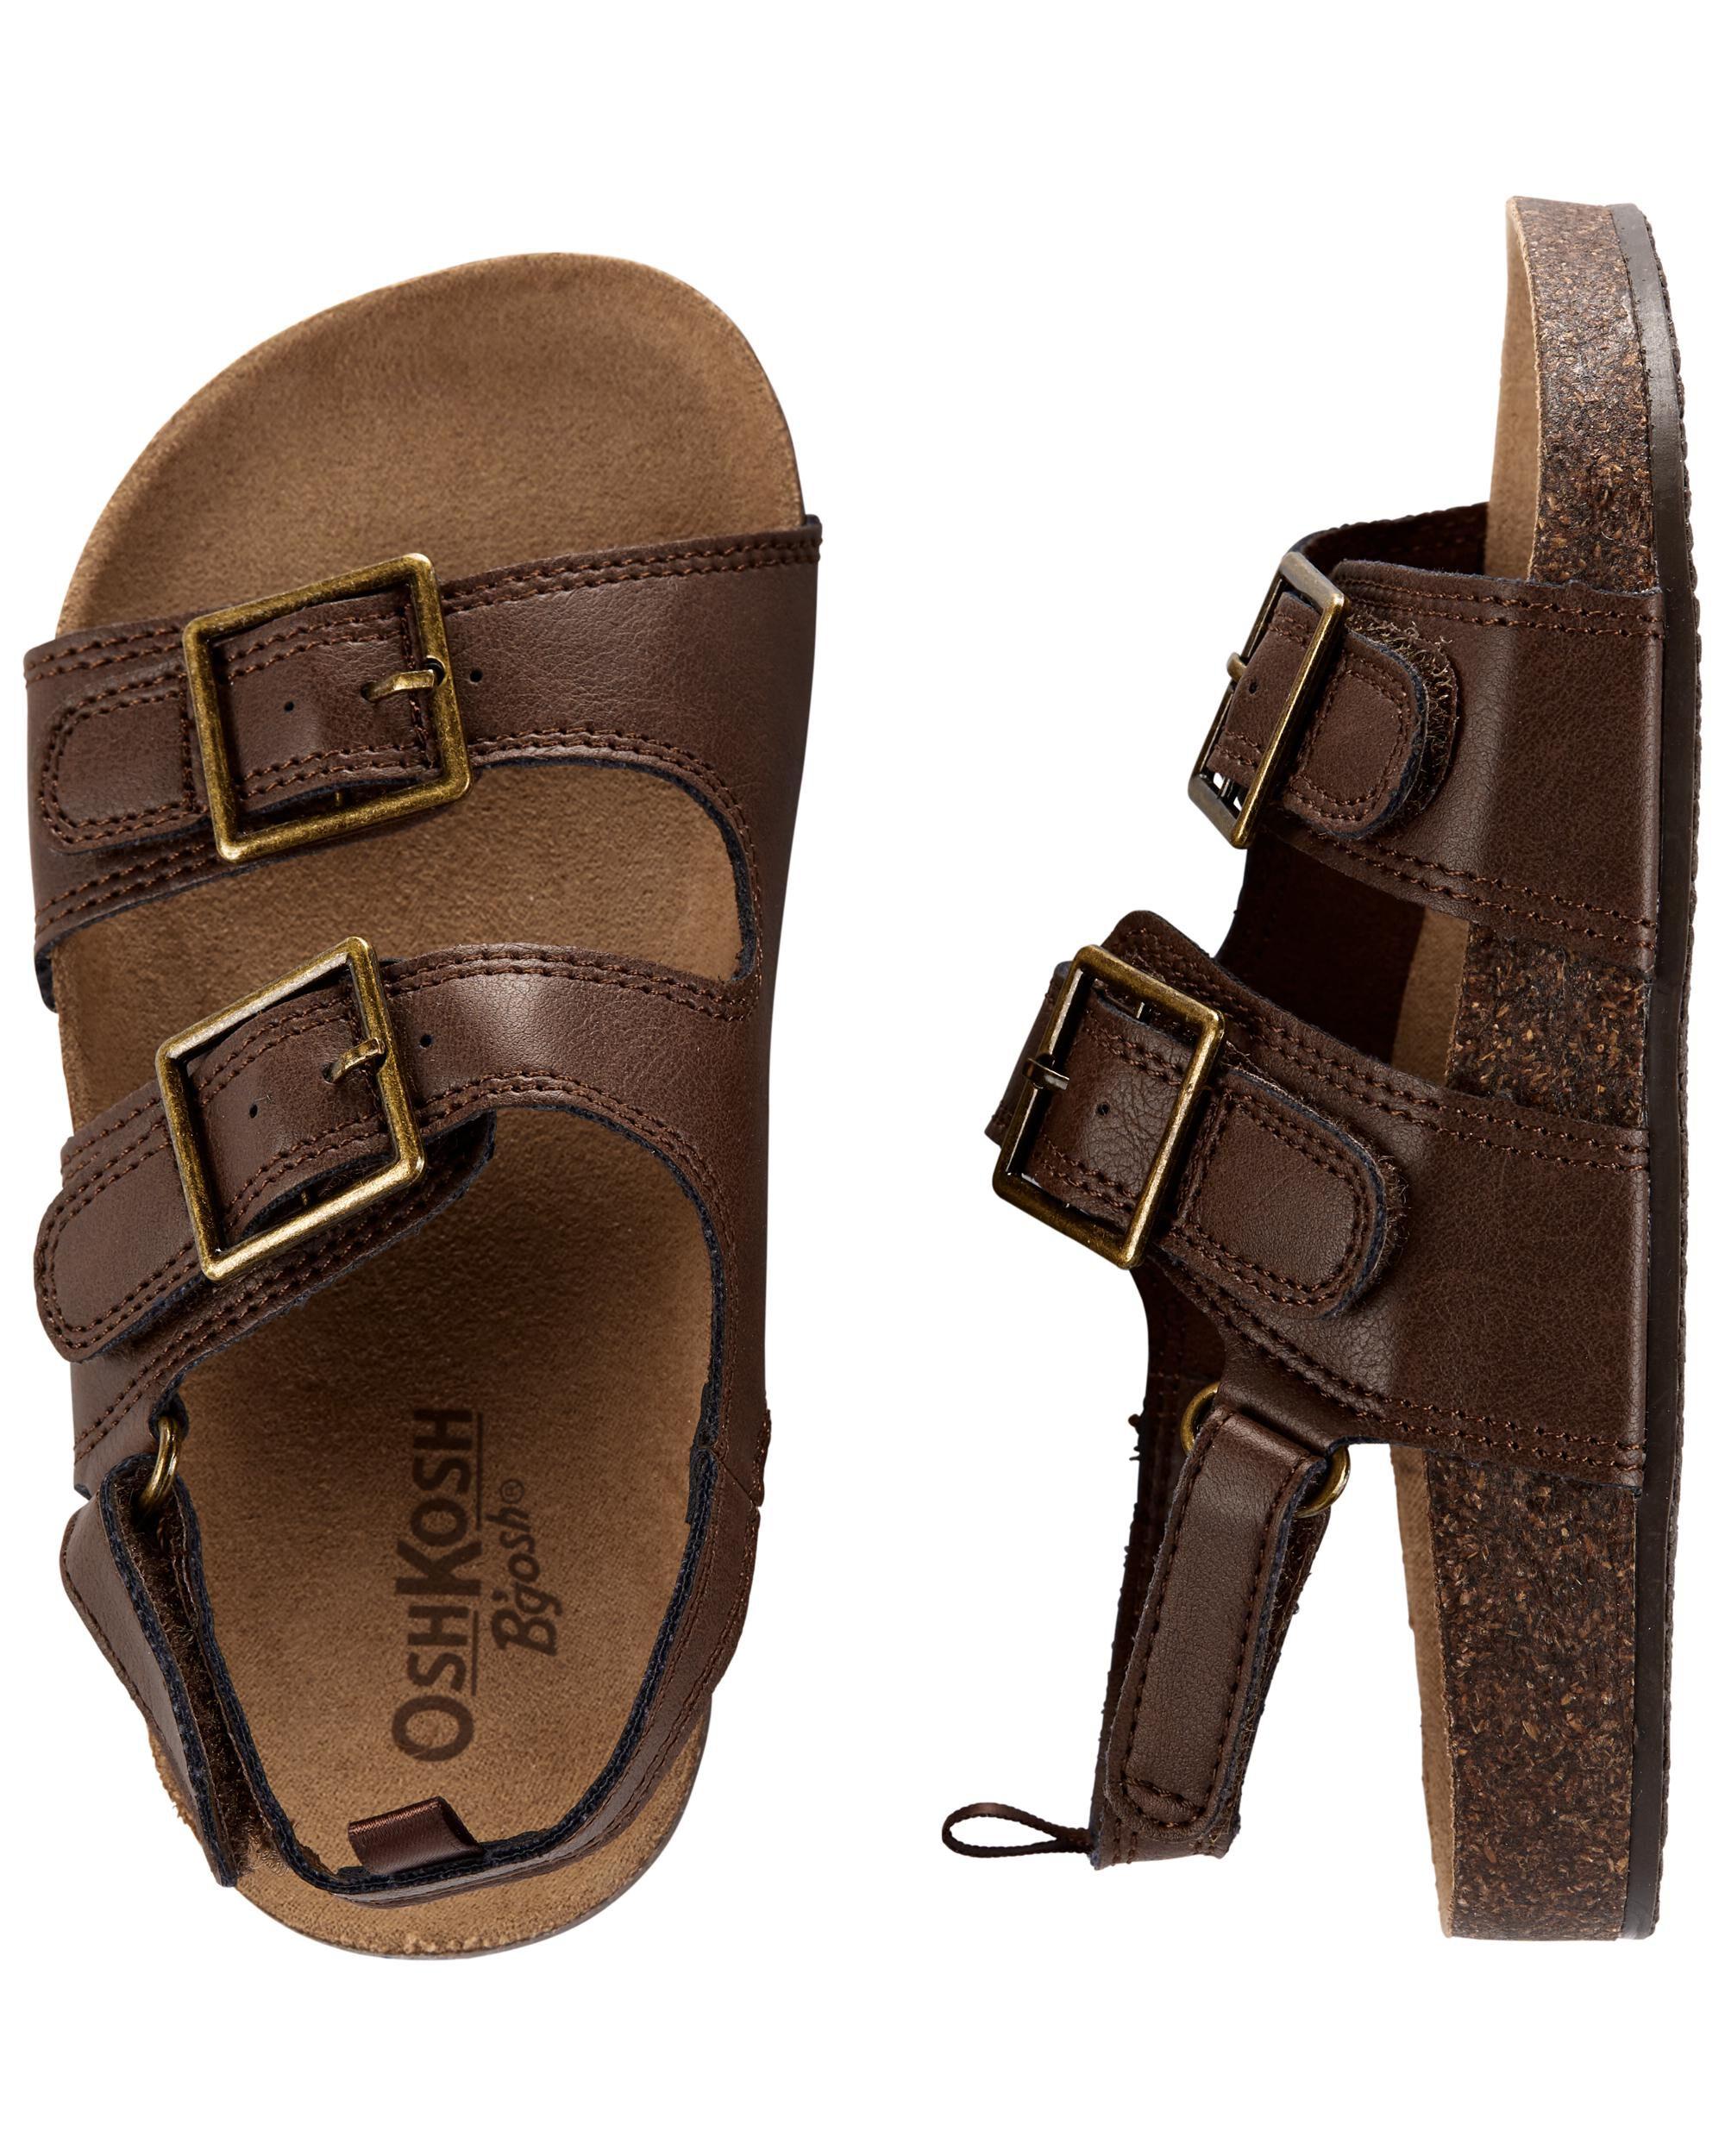 Carters Buckle Sandals